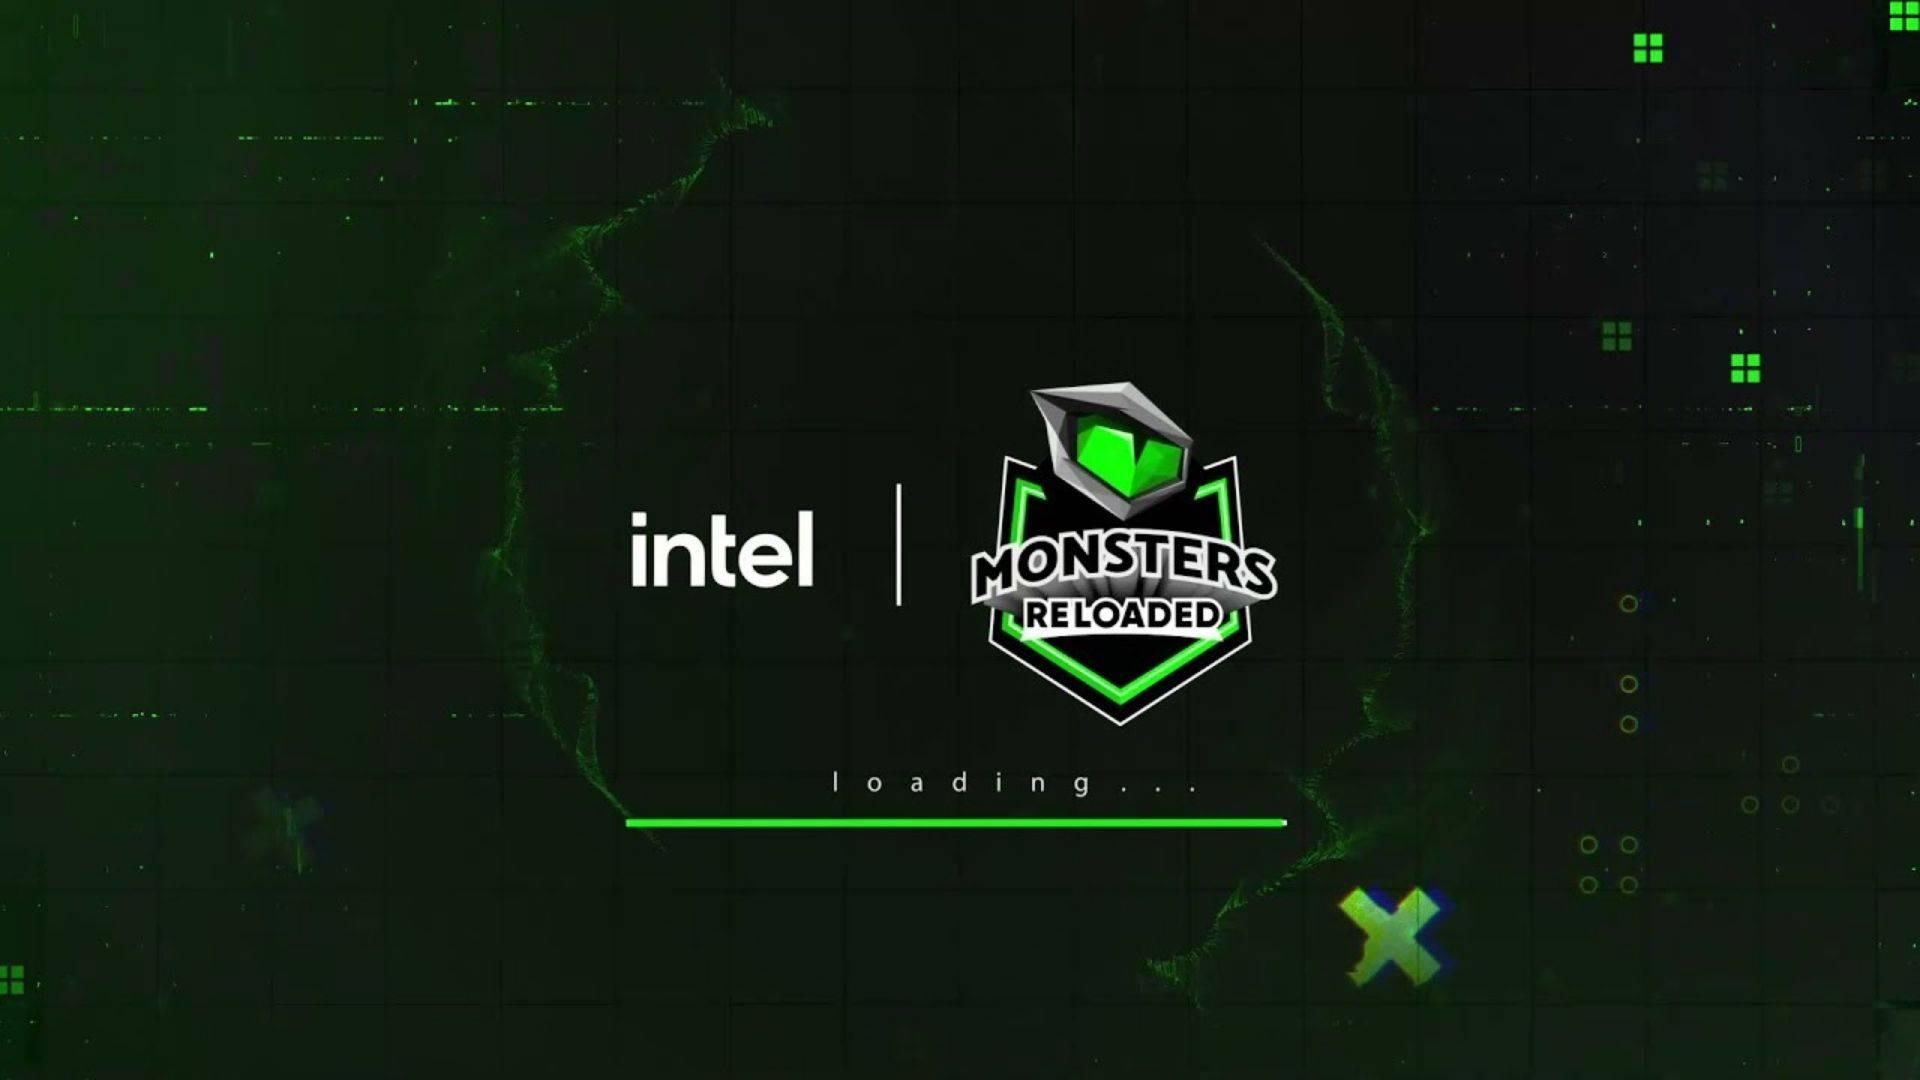 intel monsters reloaded